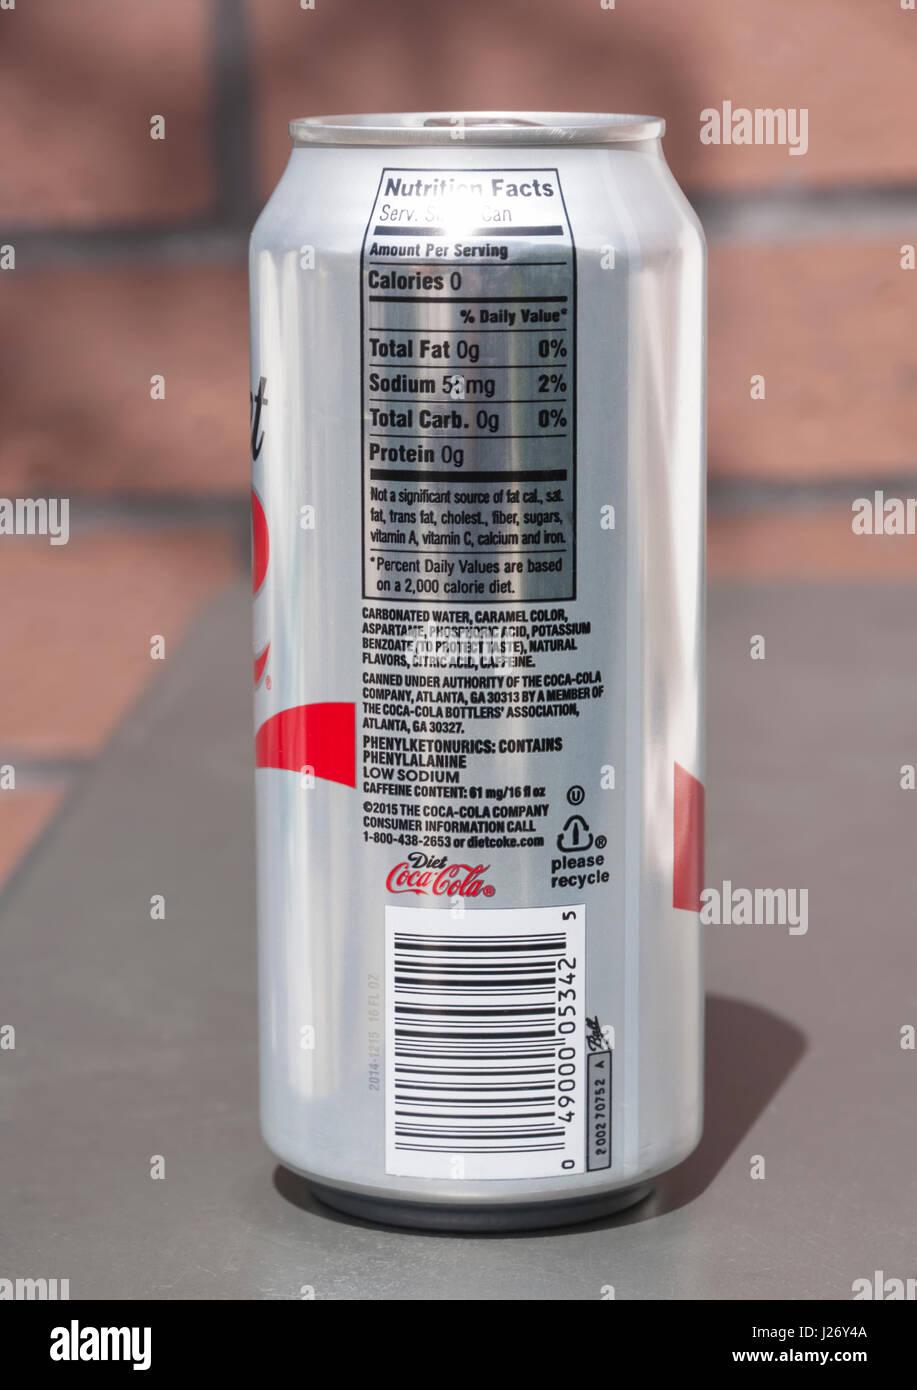 diet coke stock photos & diet coke stock images - alamy